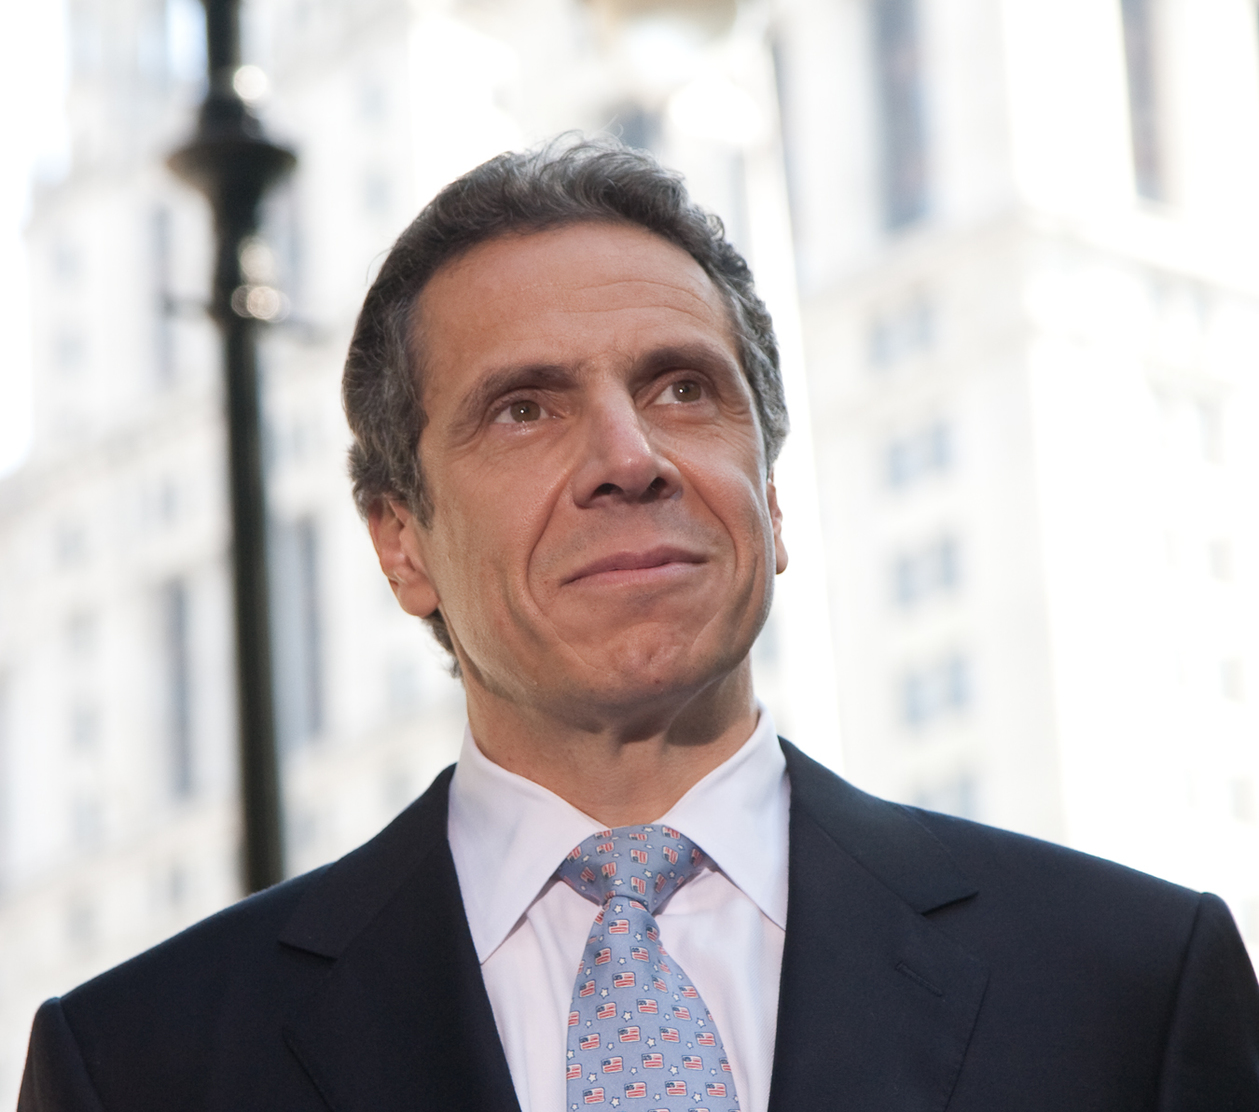 New York's governor, Andrew Cuomo.